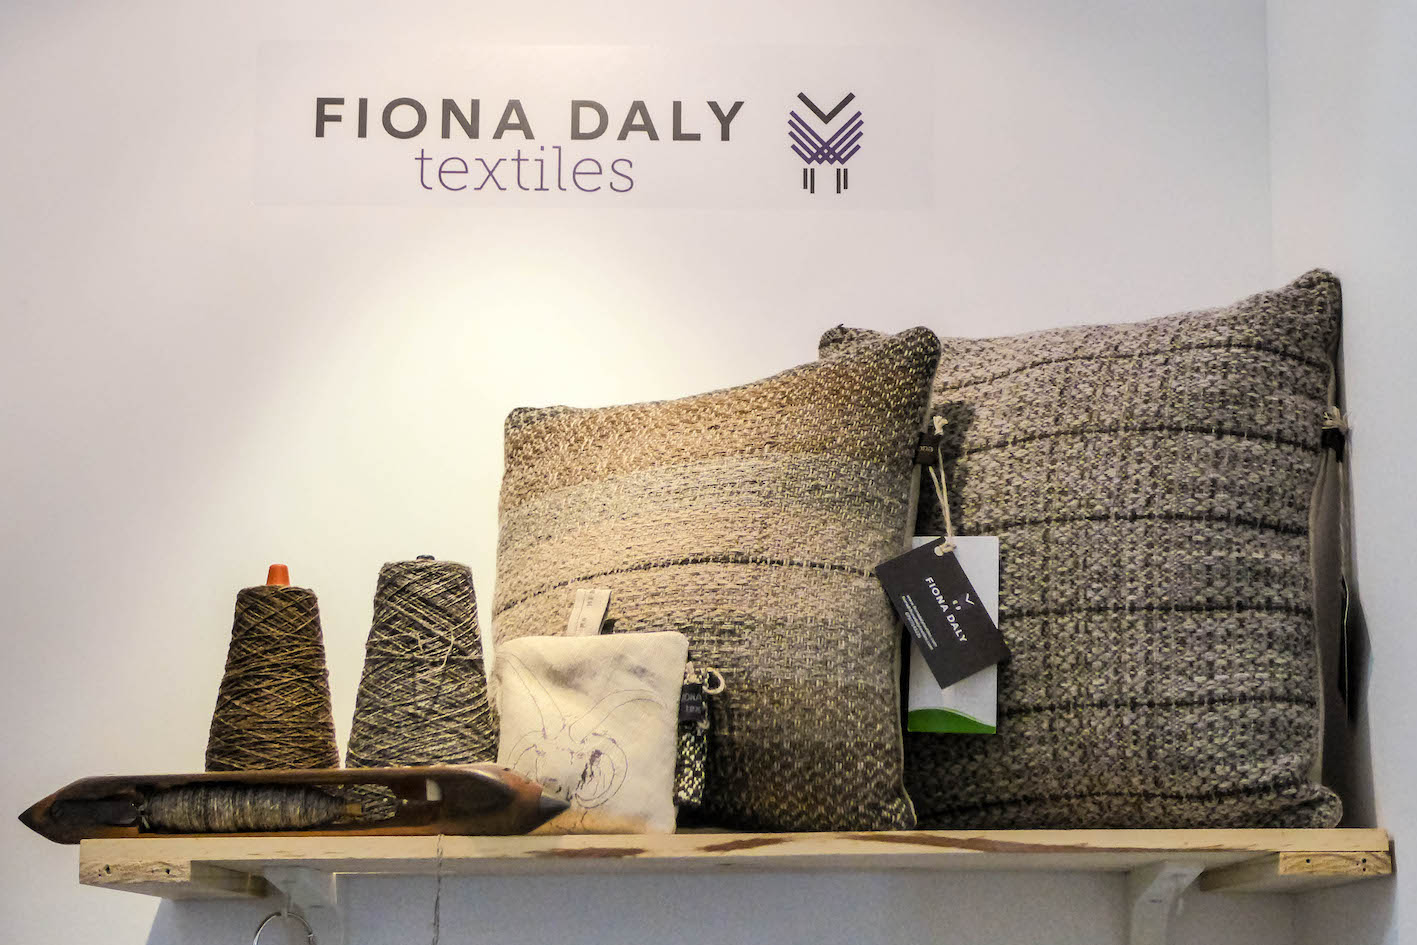 Fiona Daly Textiles